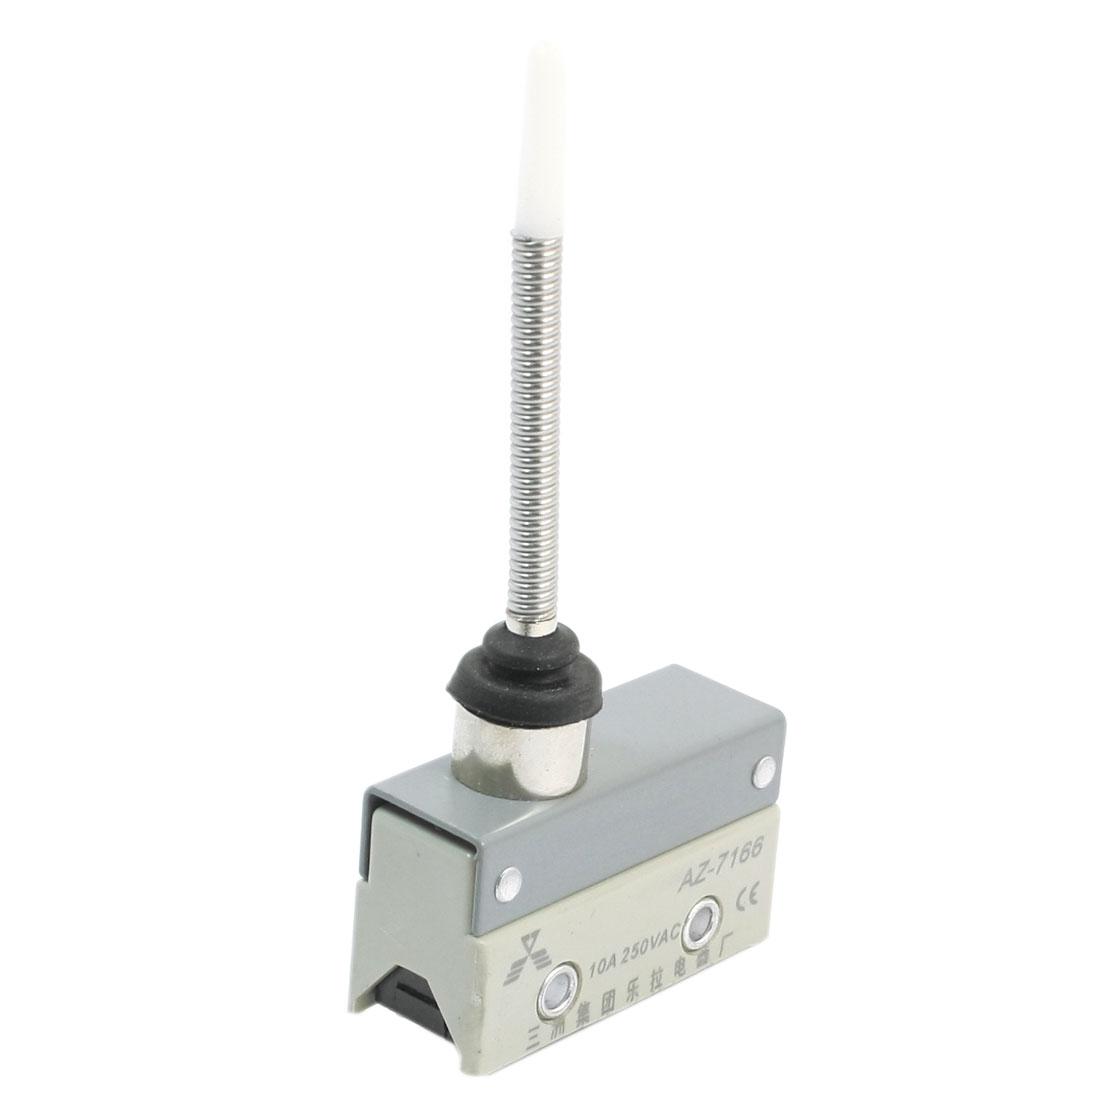 SPDT 3 Terminal Wobble Stick Momentary Limit Switch 10A/AC 250V AZ-7166